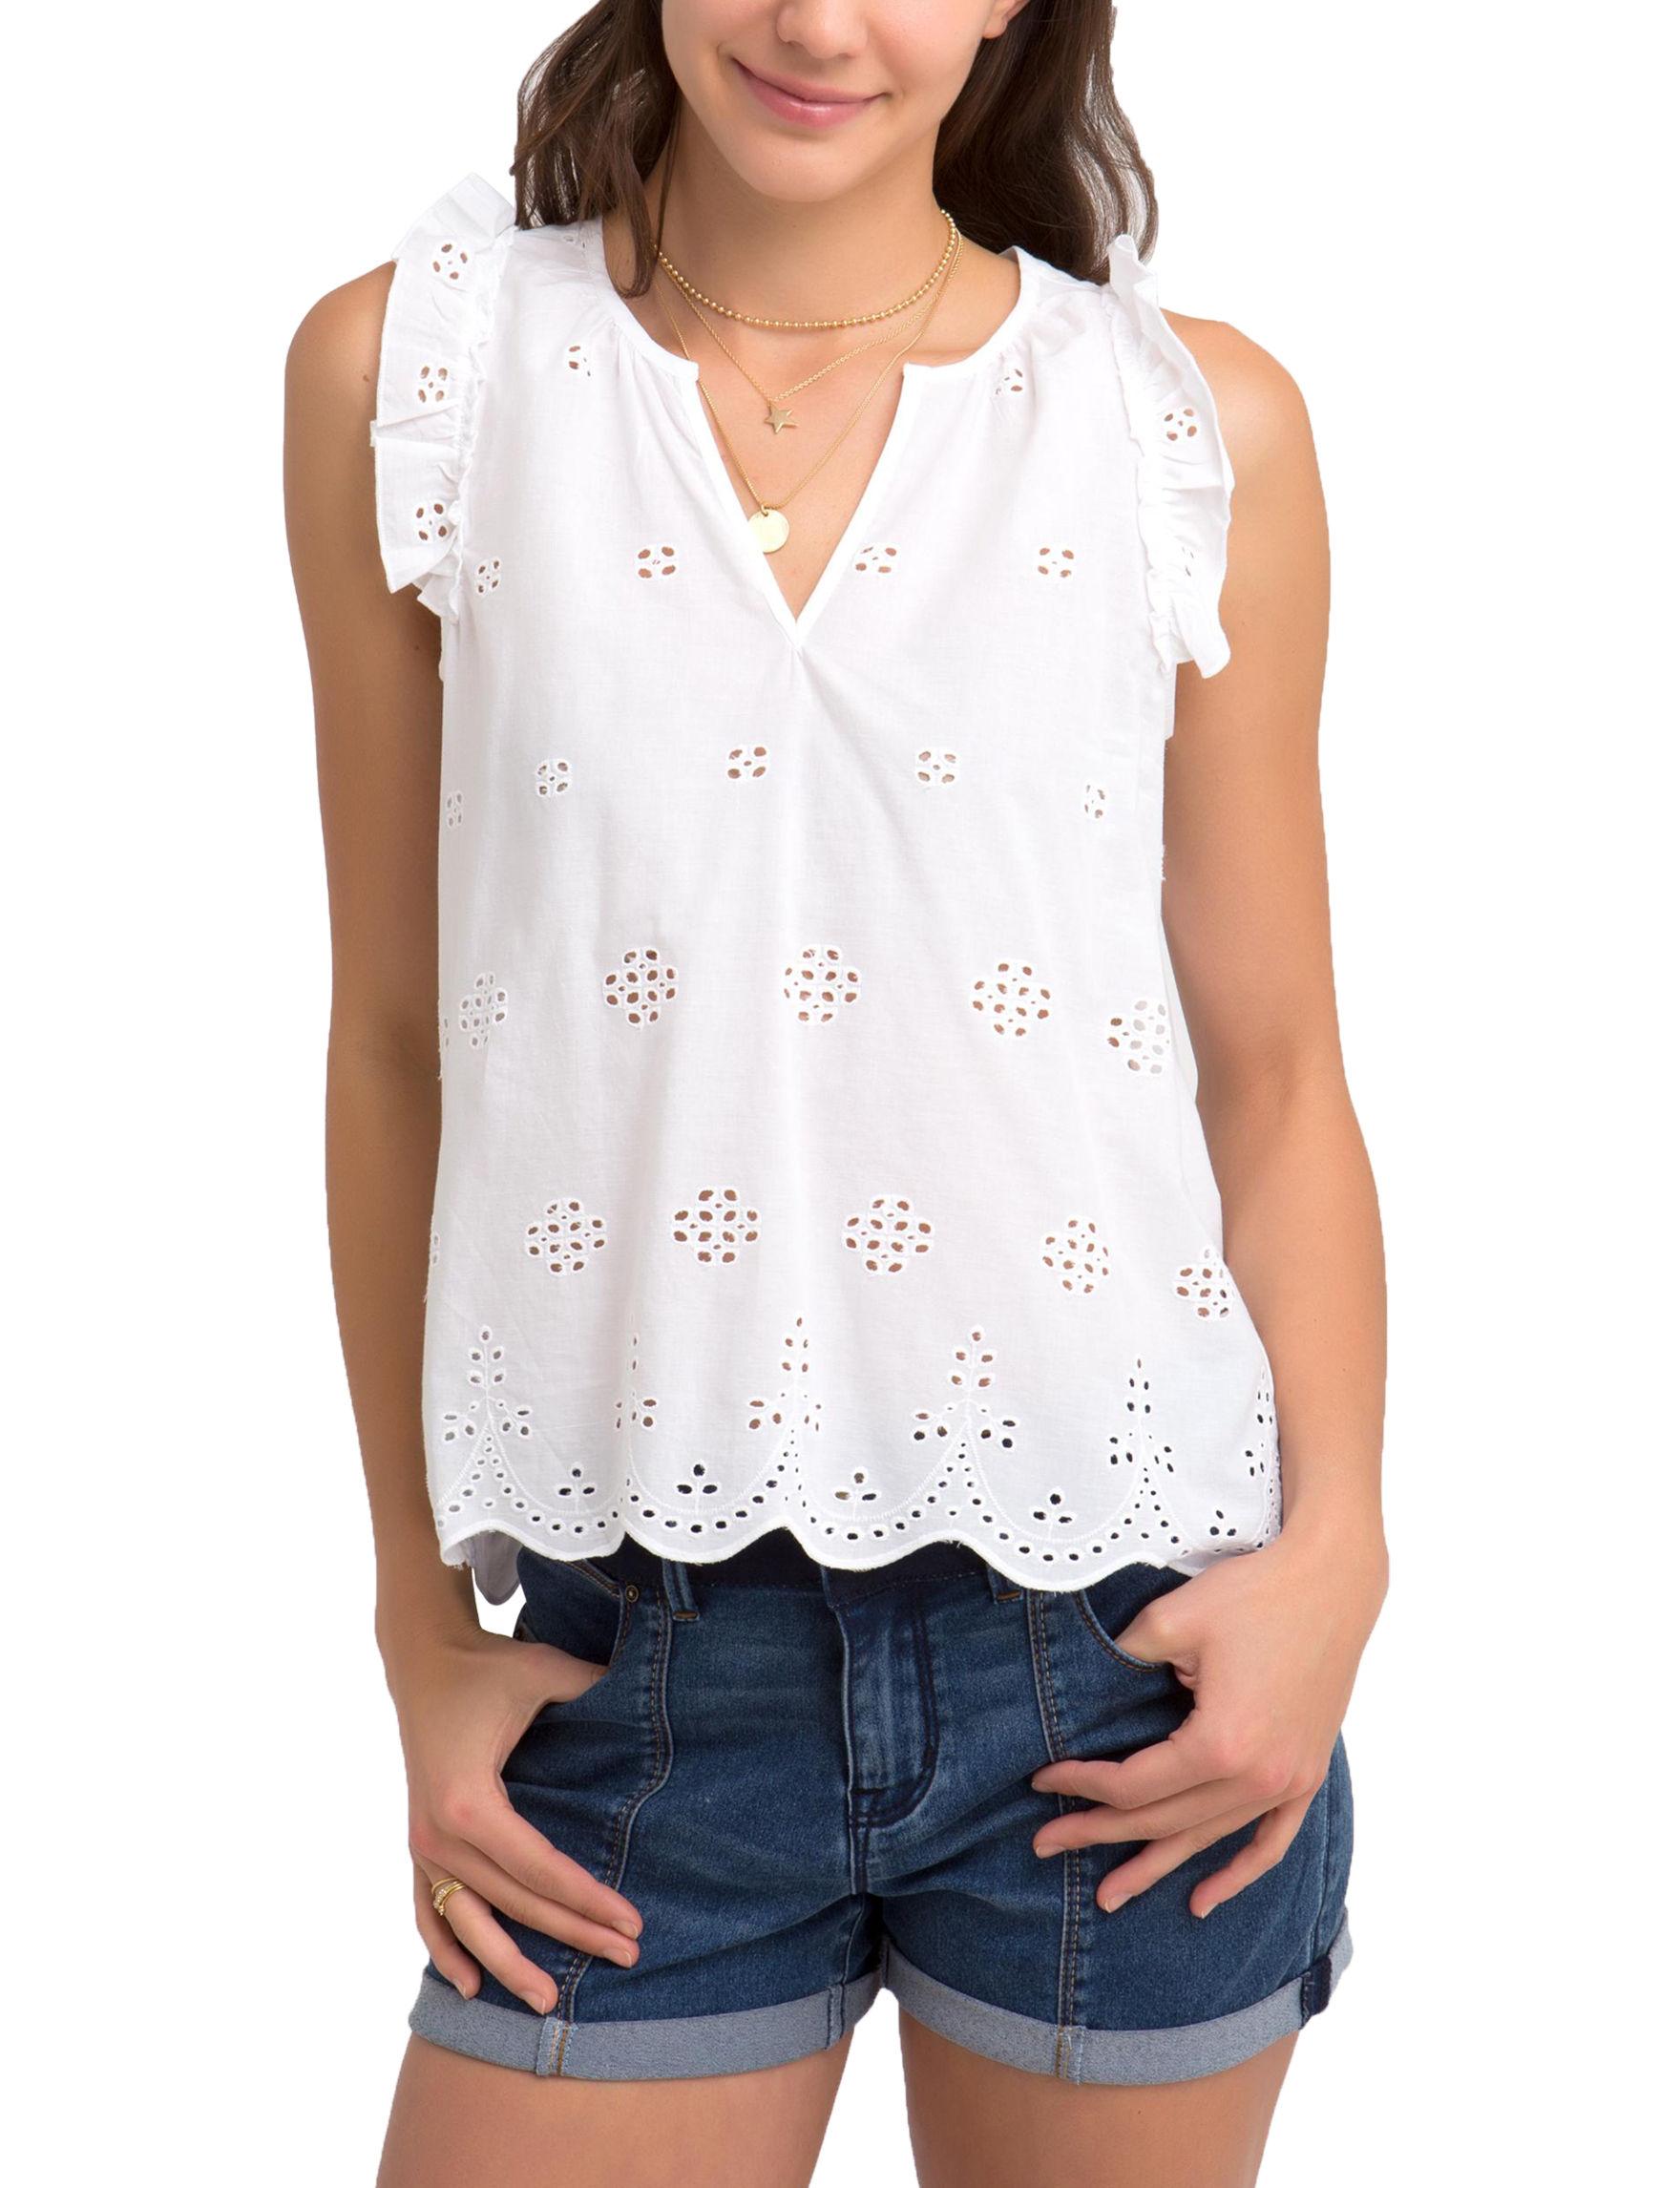 U.S. Polo Assn. White Shirts & Blouses